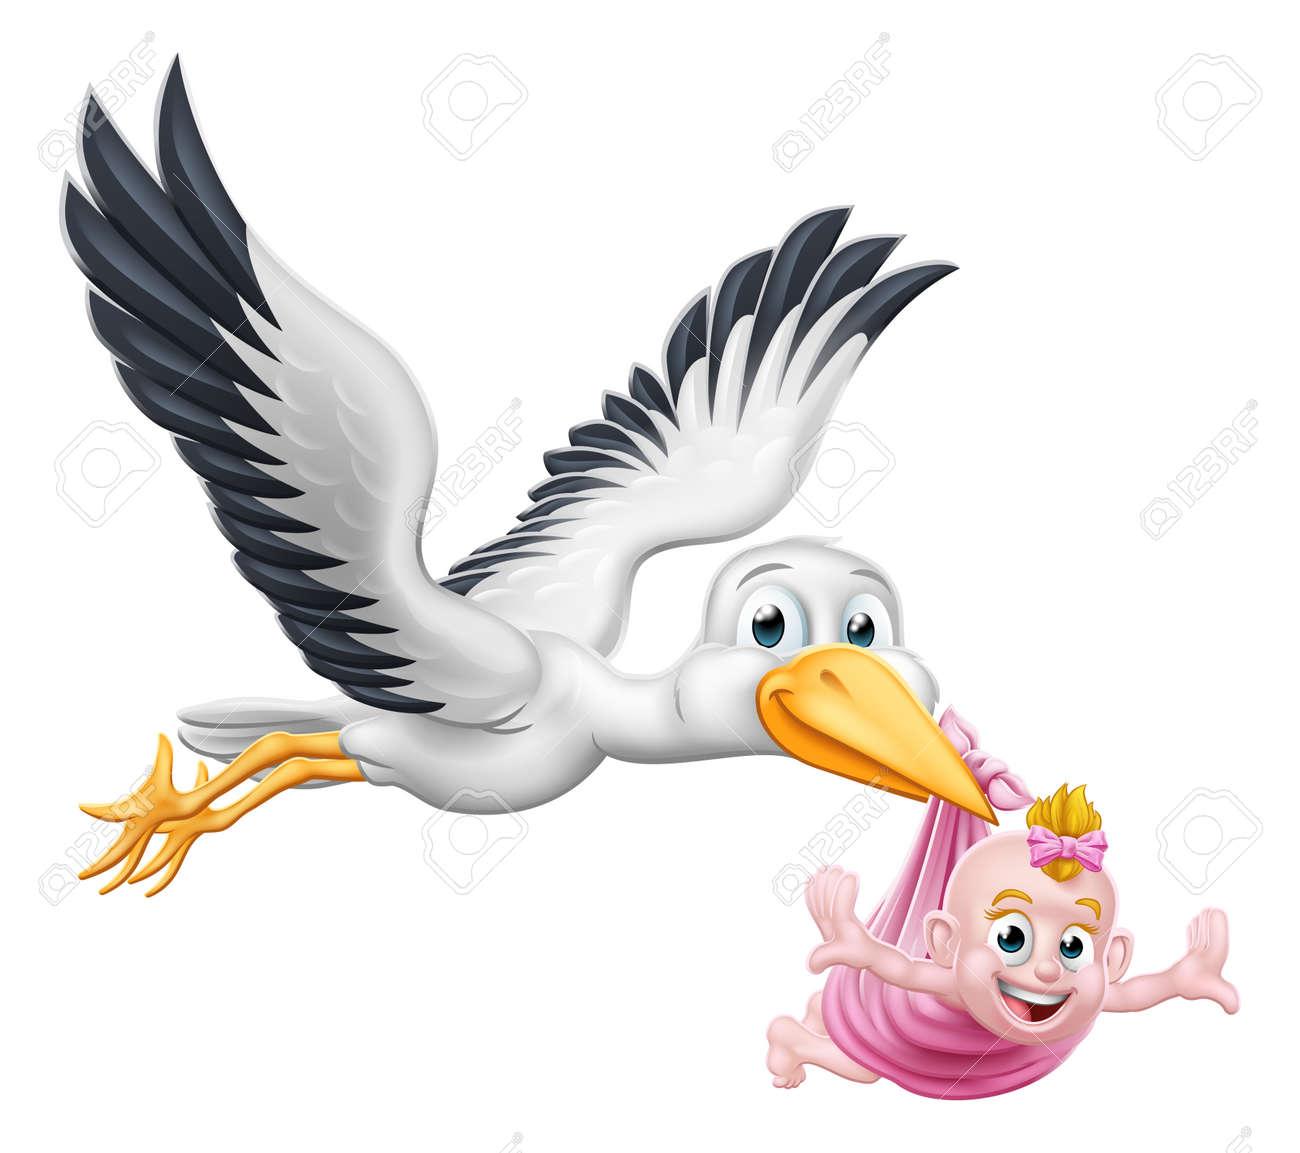 Stork Cartoon Pregnancy Myth Bird With Baby - 121818629